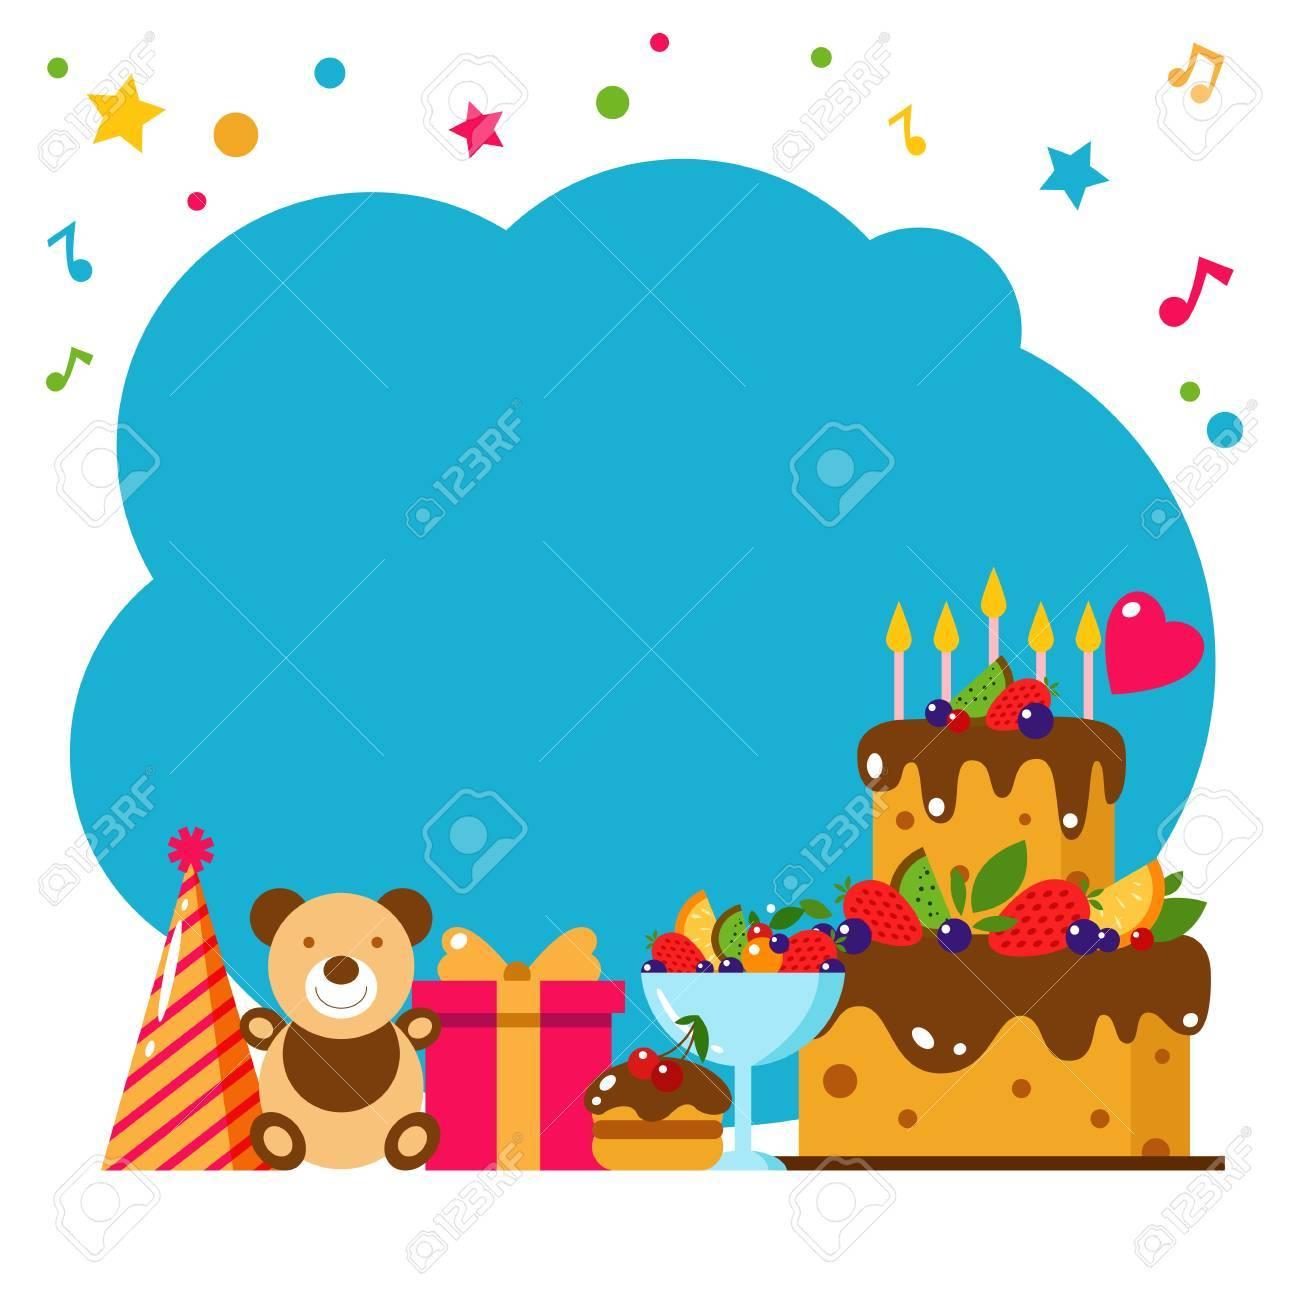 Happy Birthday Card Flat Vector Illustration Kids Party Design